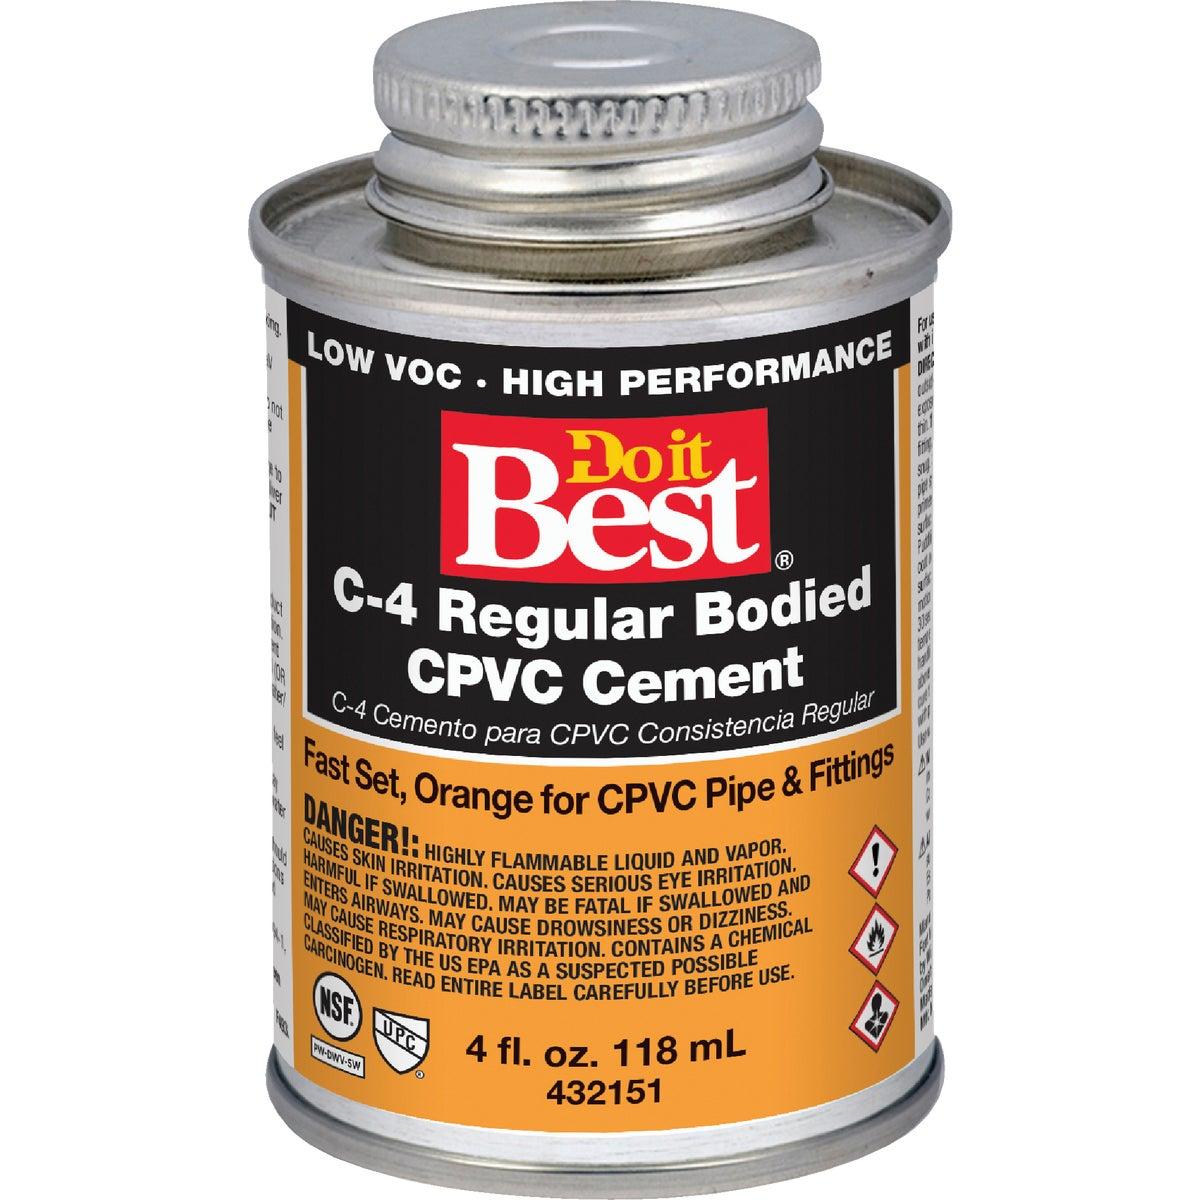 1/4 PINT CPVC CEMENT - 018706 by Wm H Harvey Co